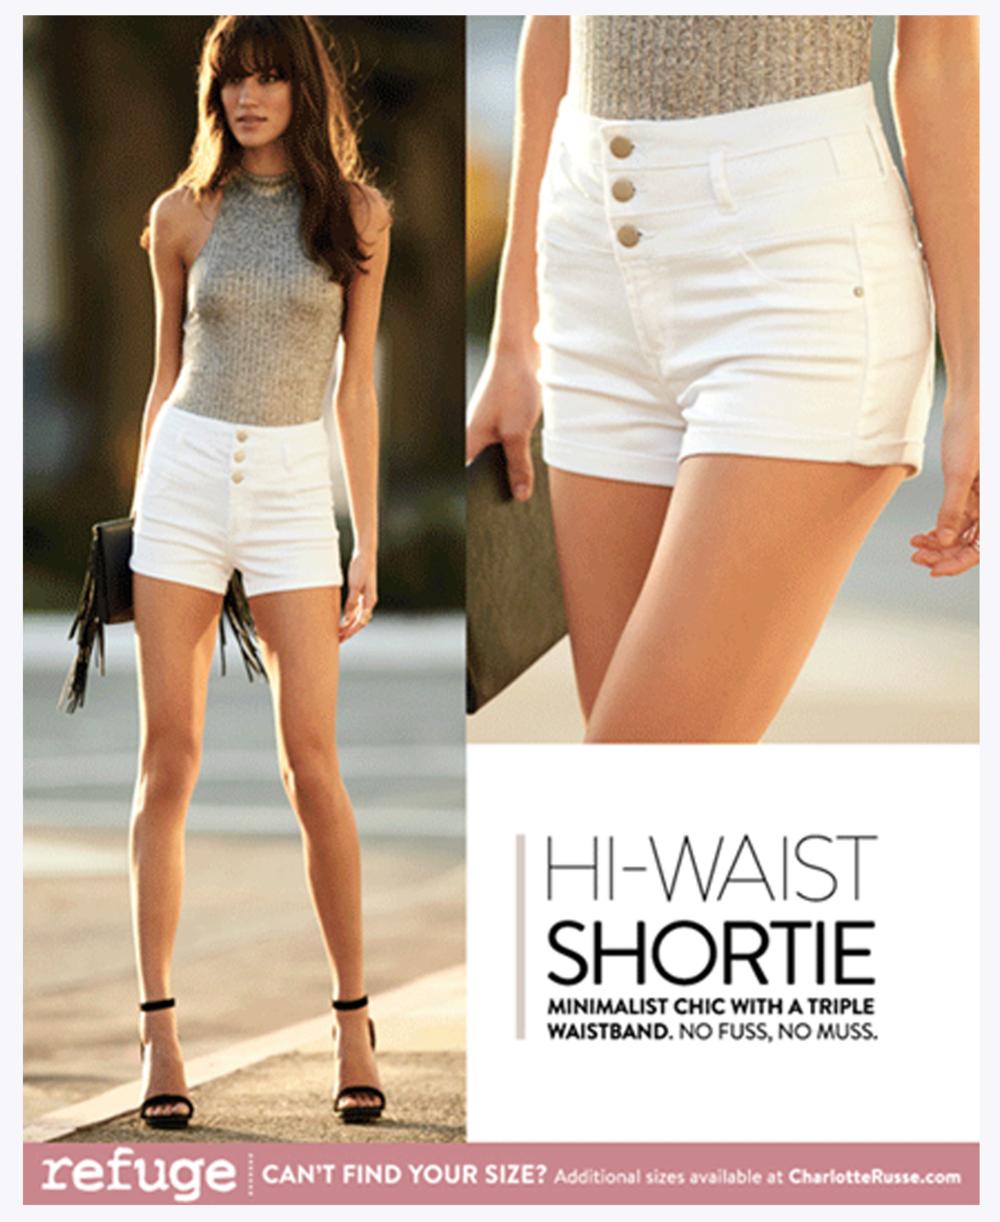 hi waist shortie.png